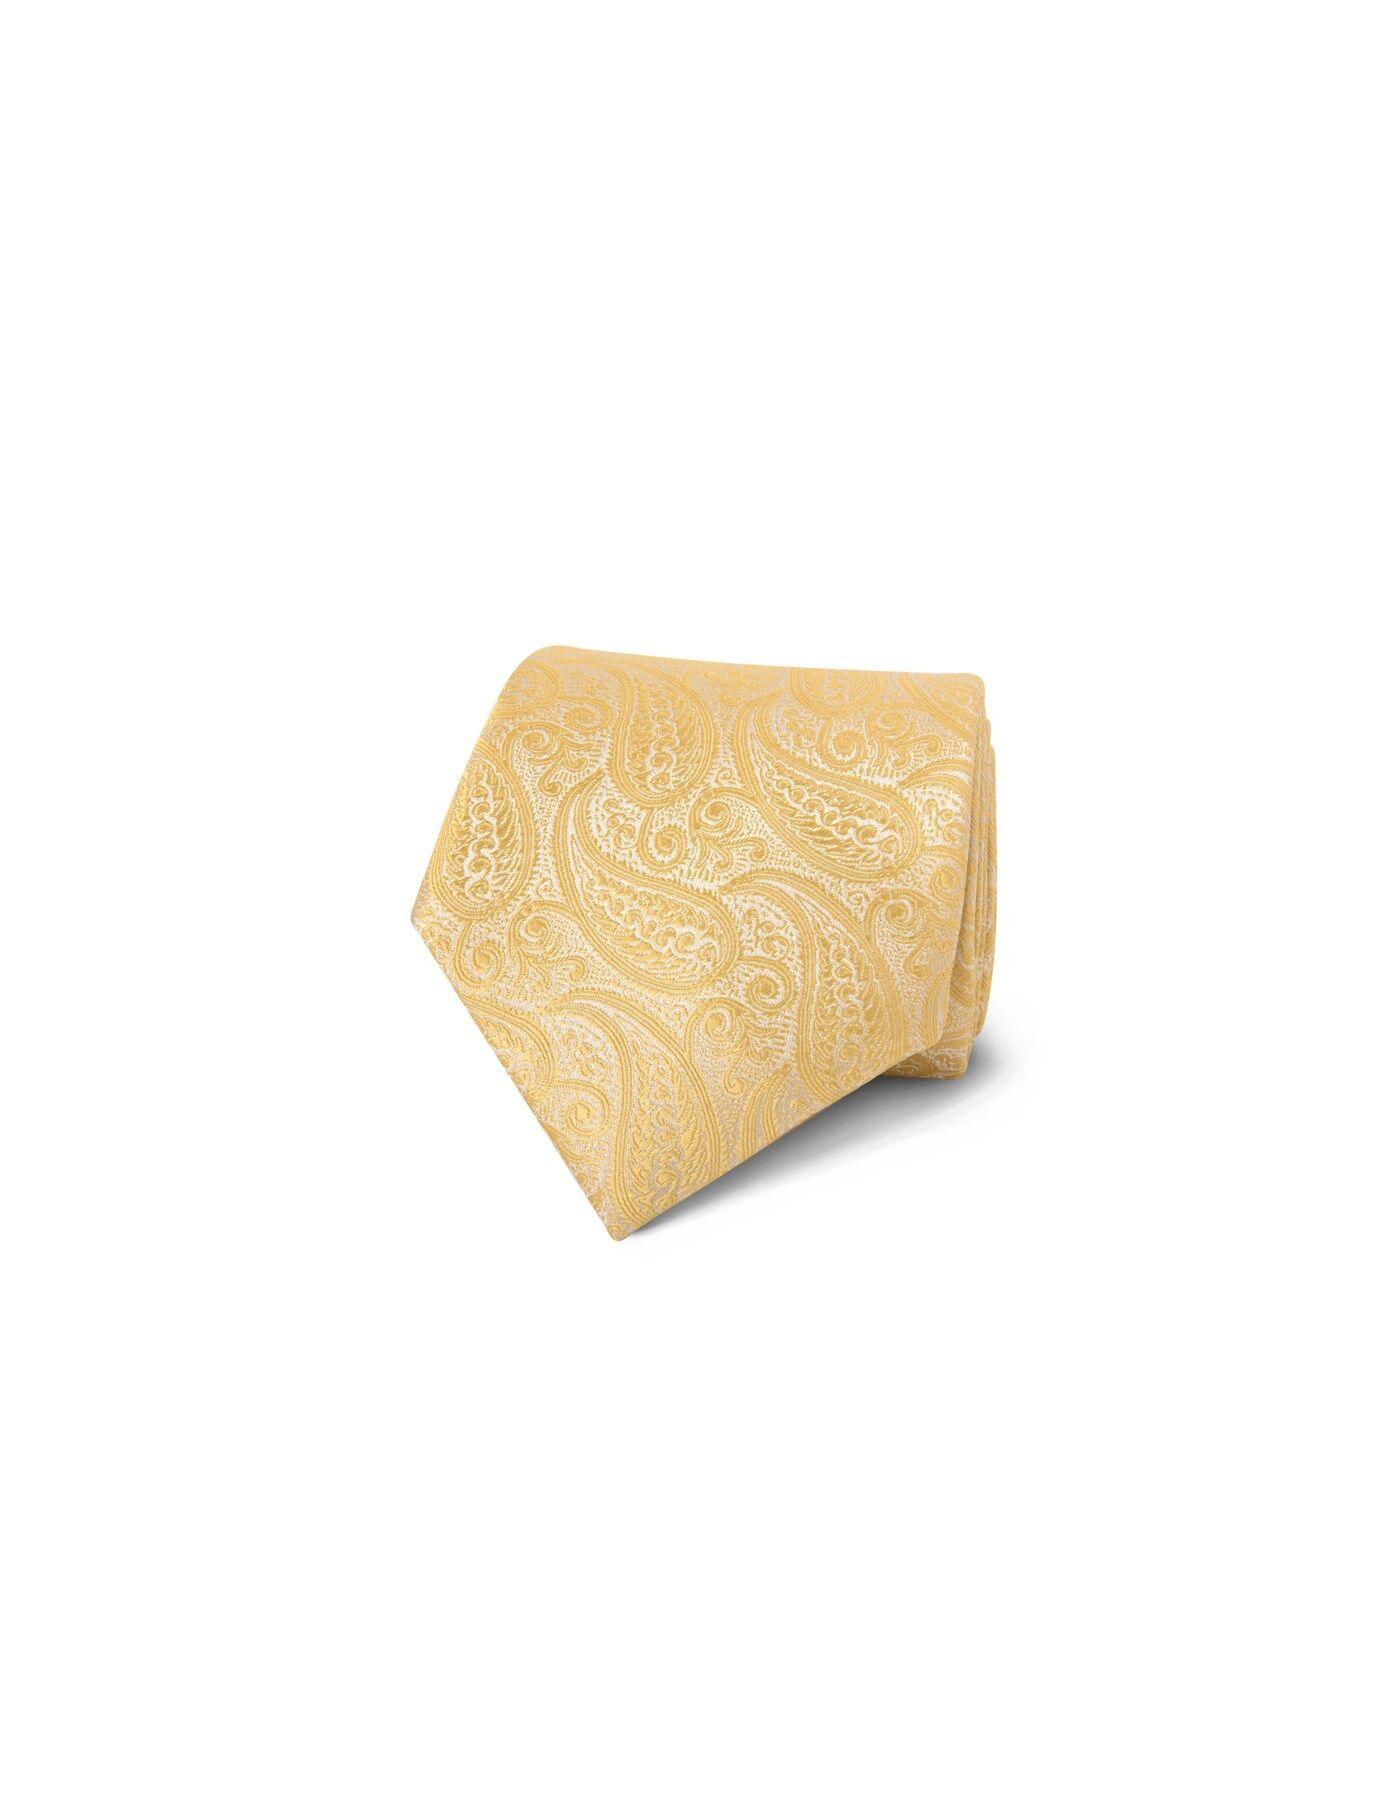 Hawes & Curtis Men's Luxury Paisley Tie in Yellow 100% Silk